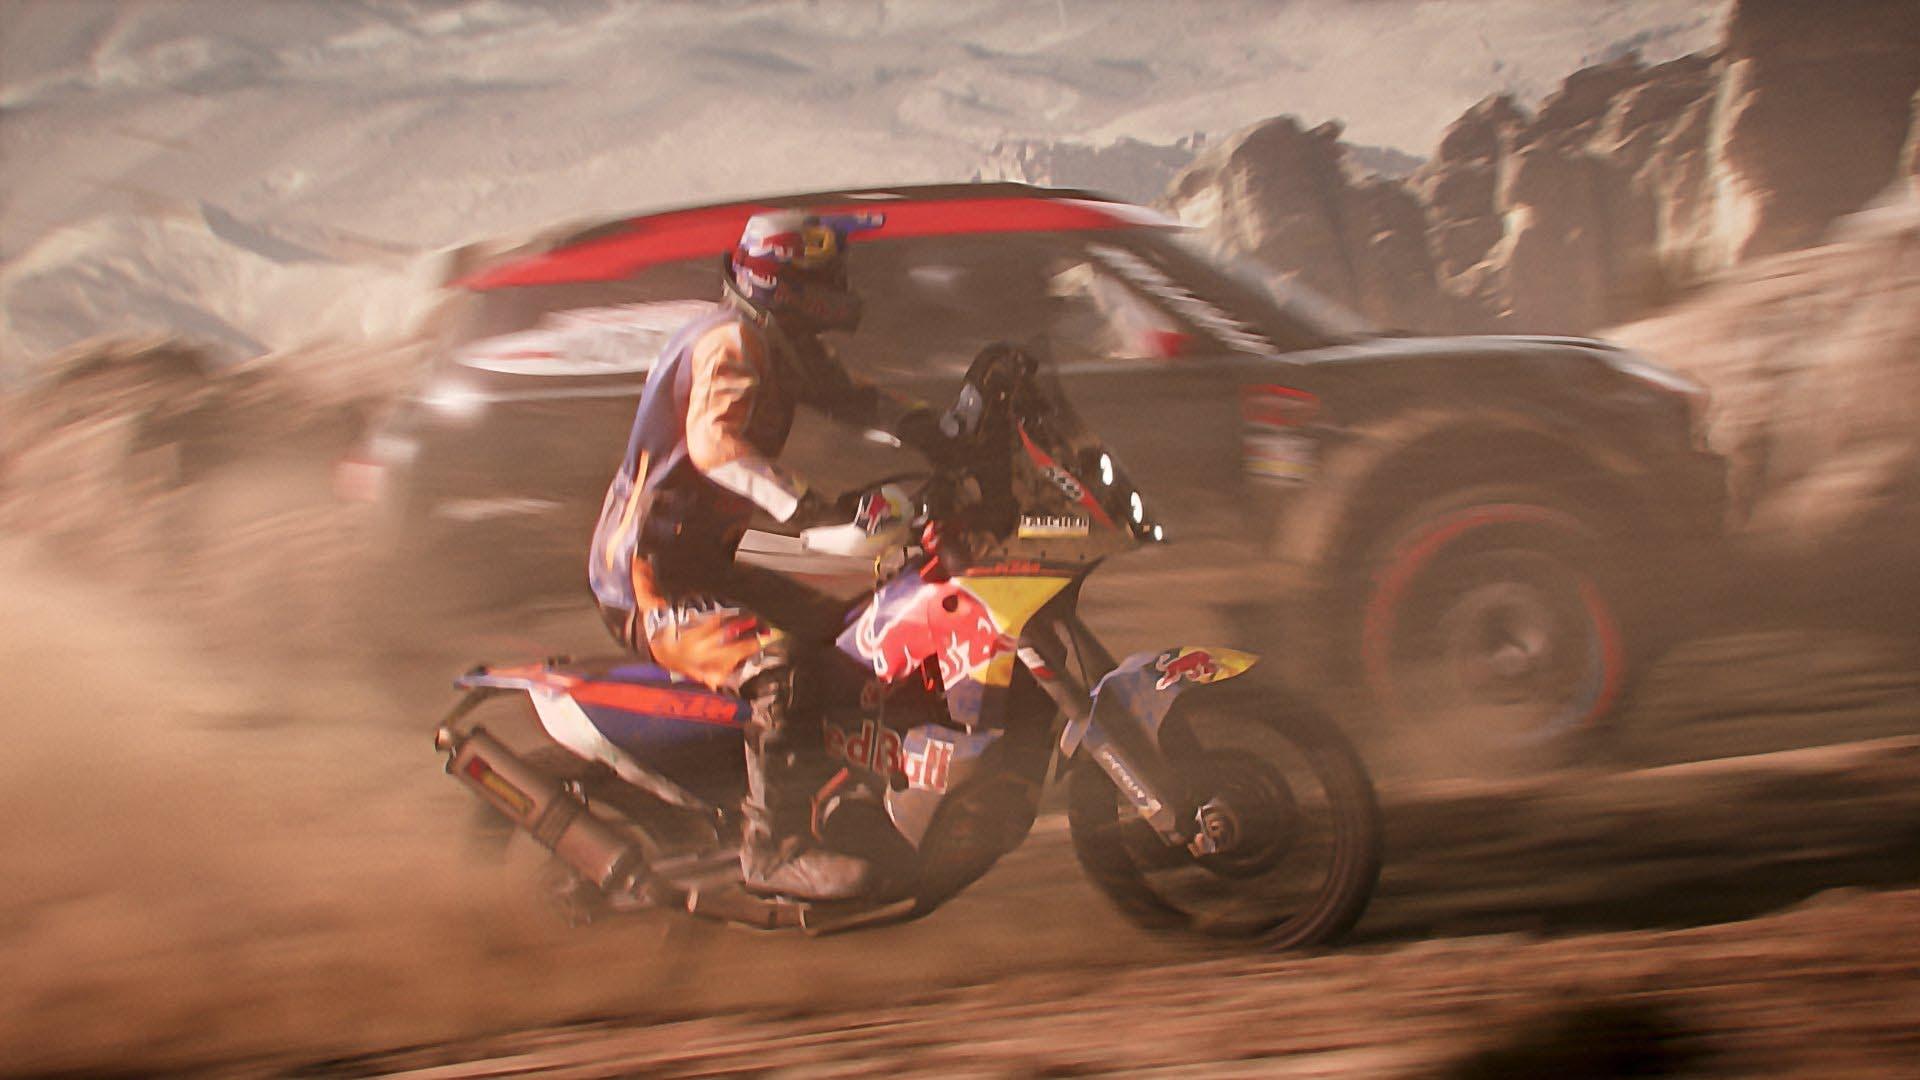 Supervivencia al volante, así se muestra Dakar 18 en este extenso gameplay 3